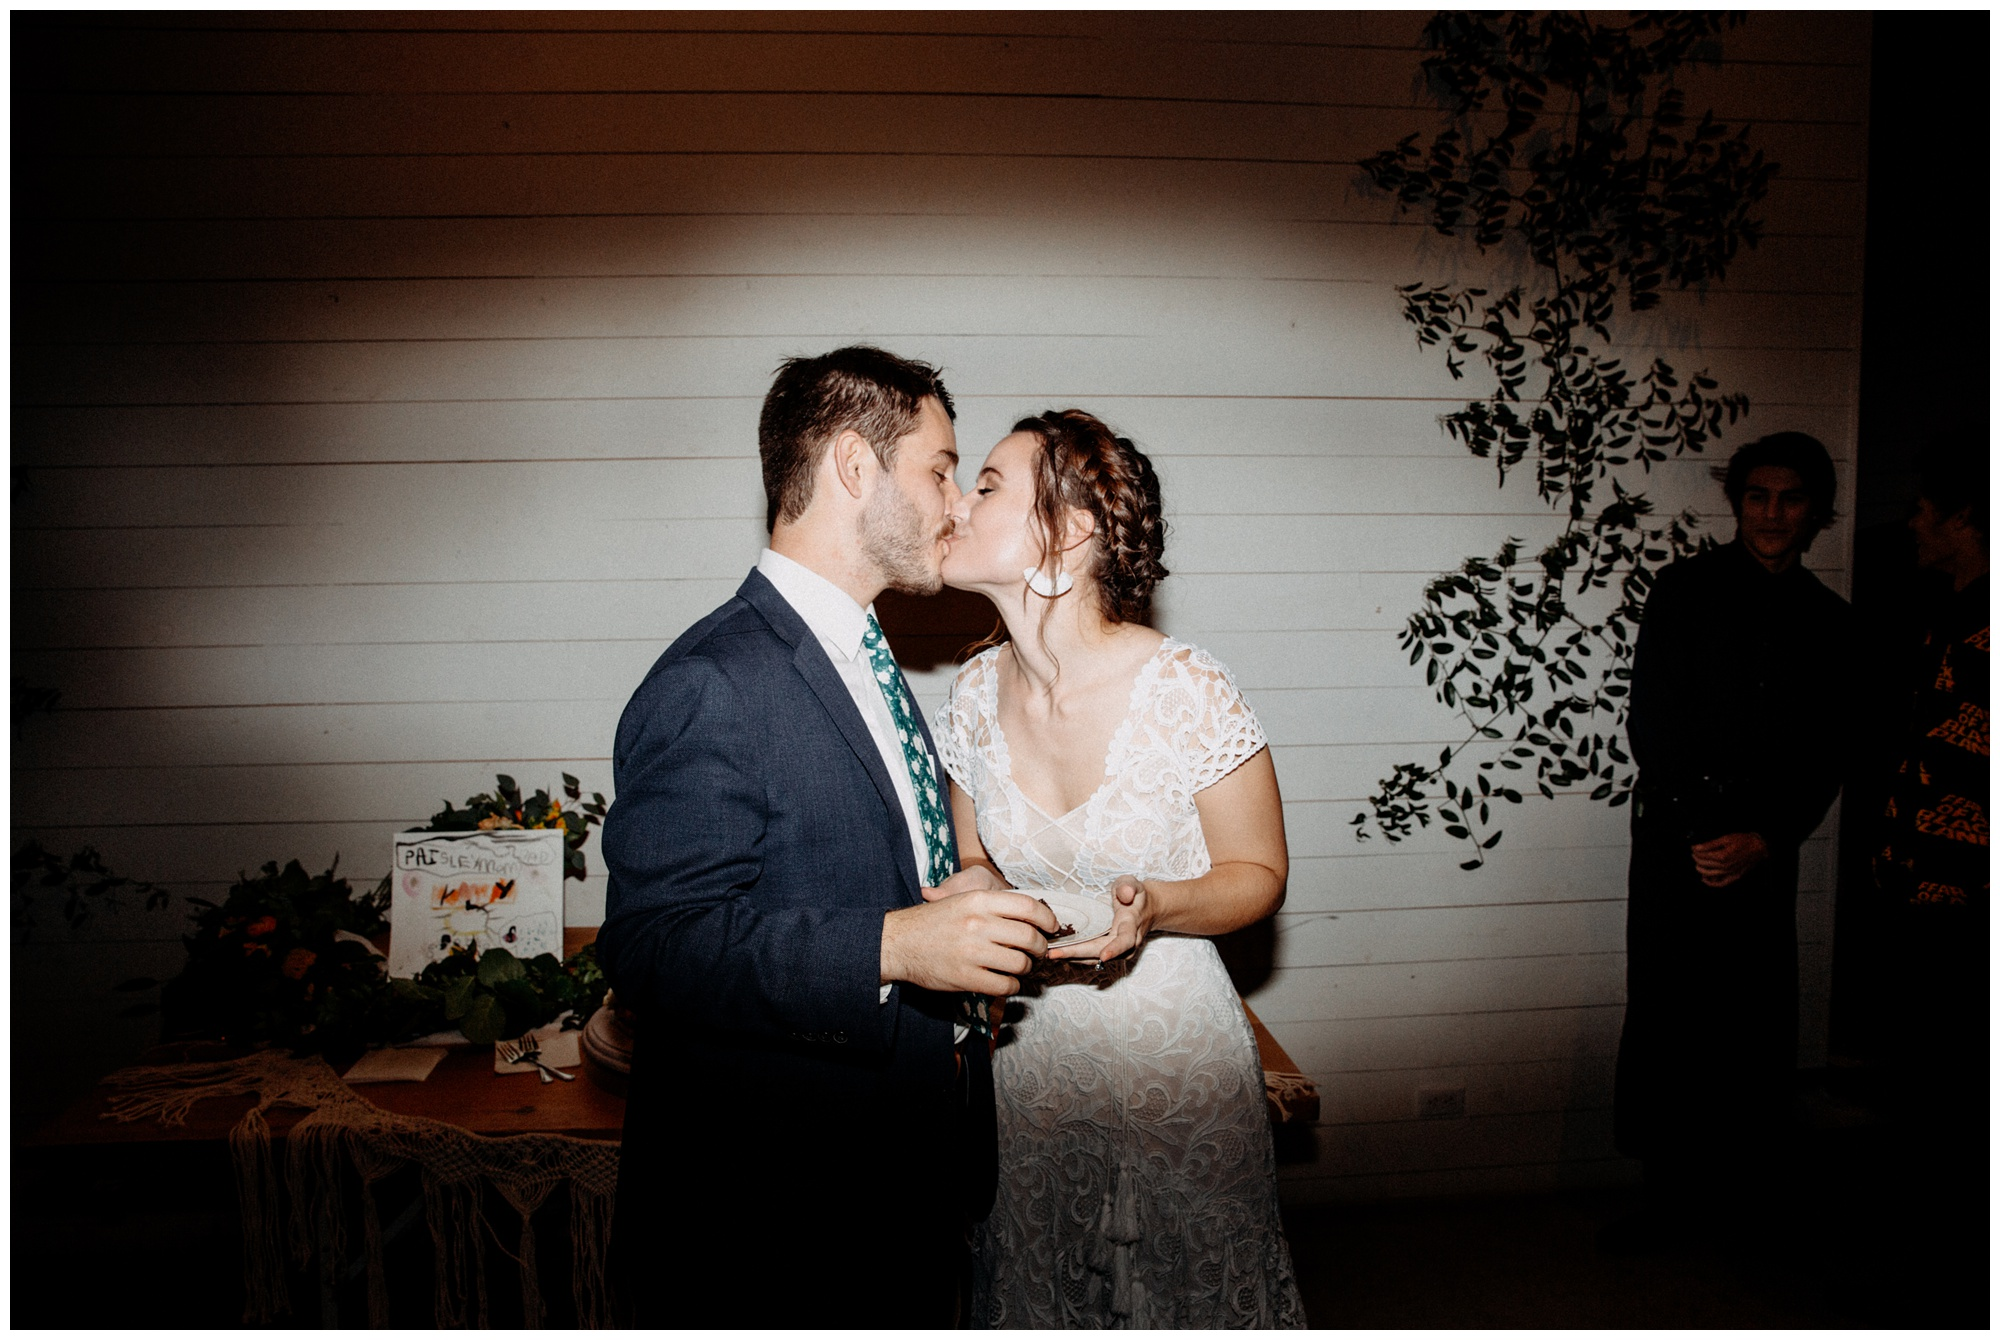 AUSTIN-TEXAS-PROSPECT-HOUSE-WEDDING-VENUE-PHOTOGRAPHY25852.JPG